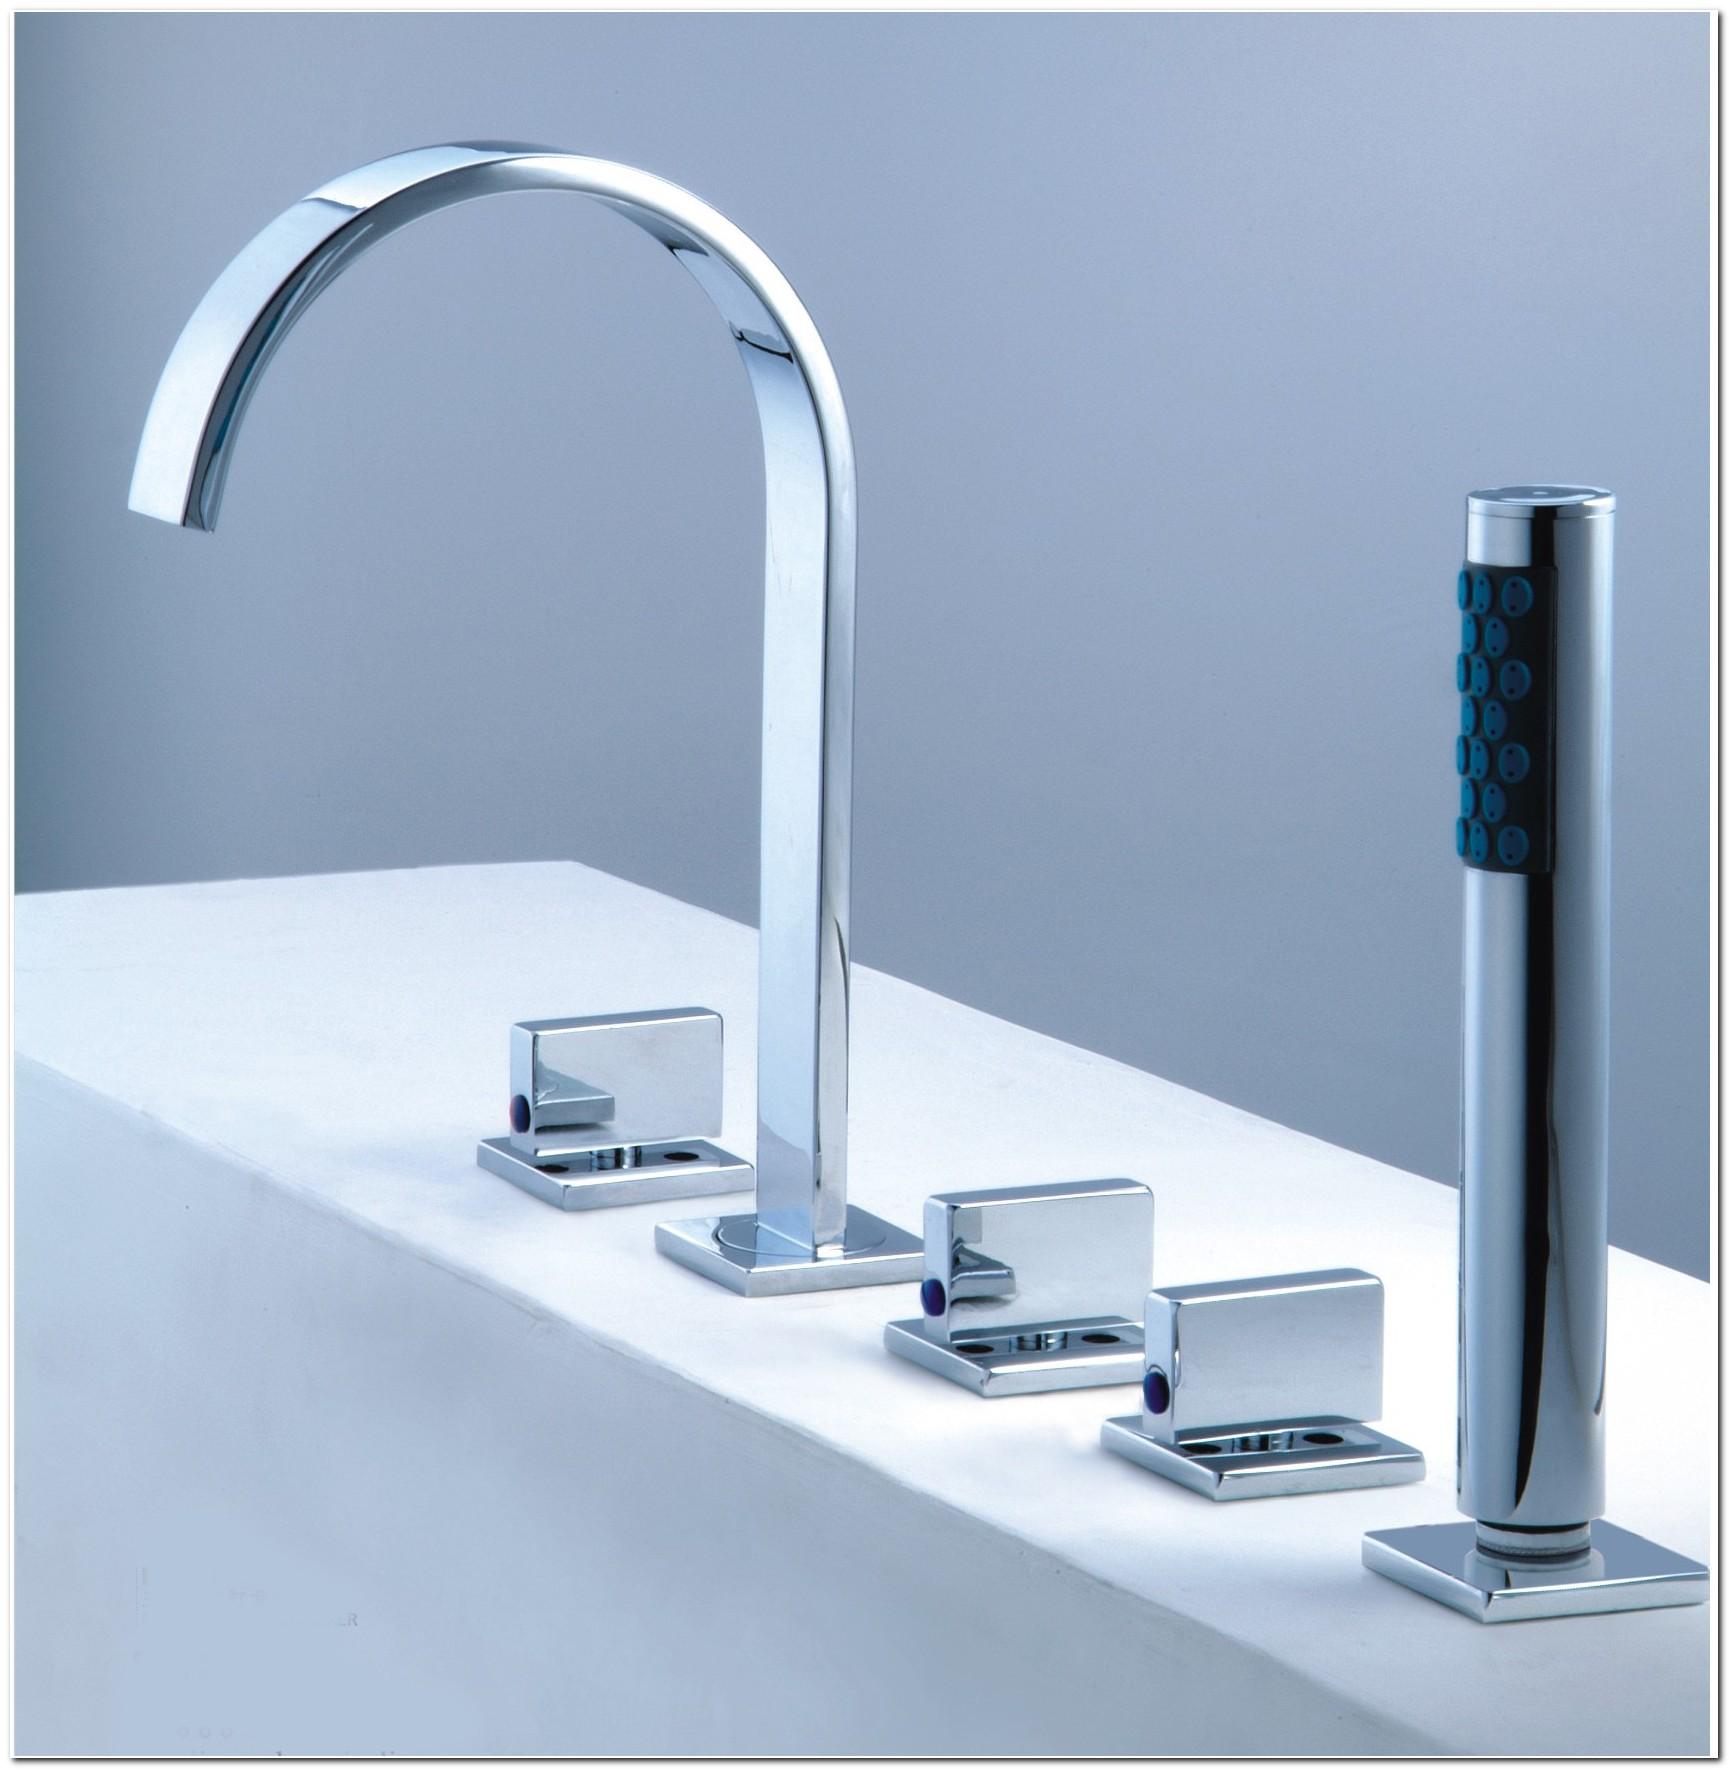 5 Hole Roman Tub Faucet